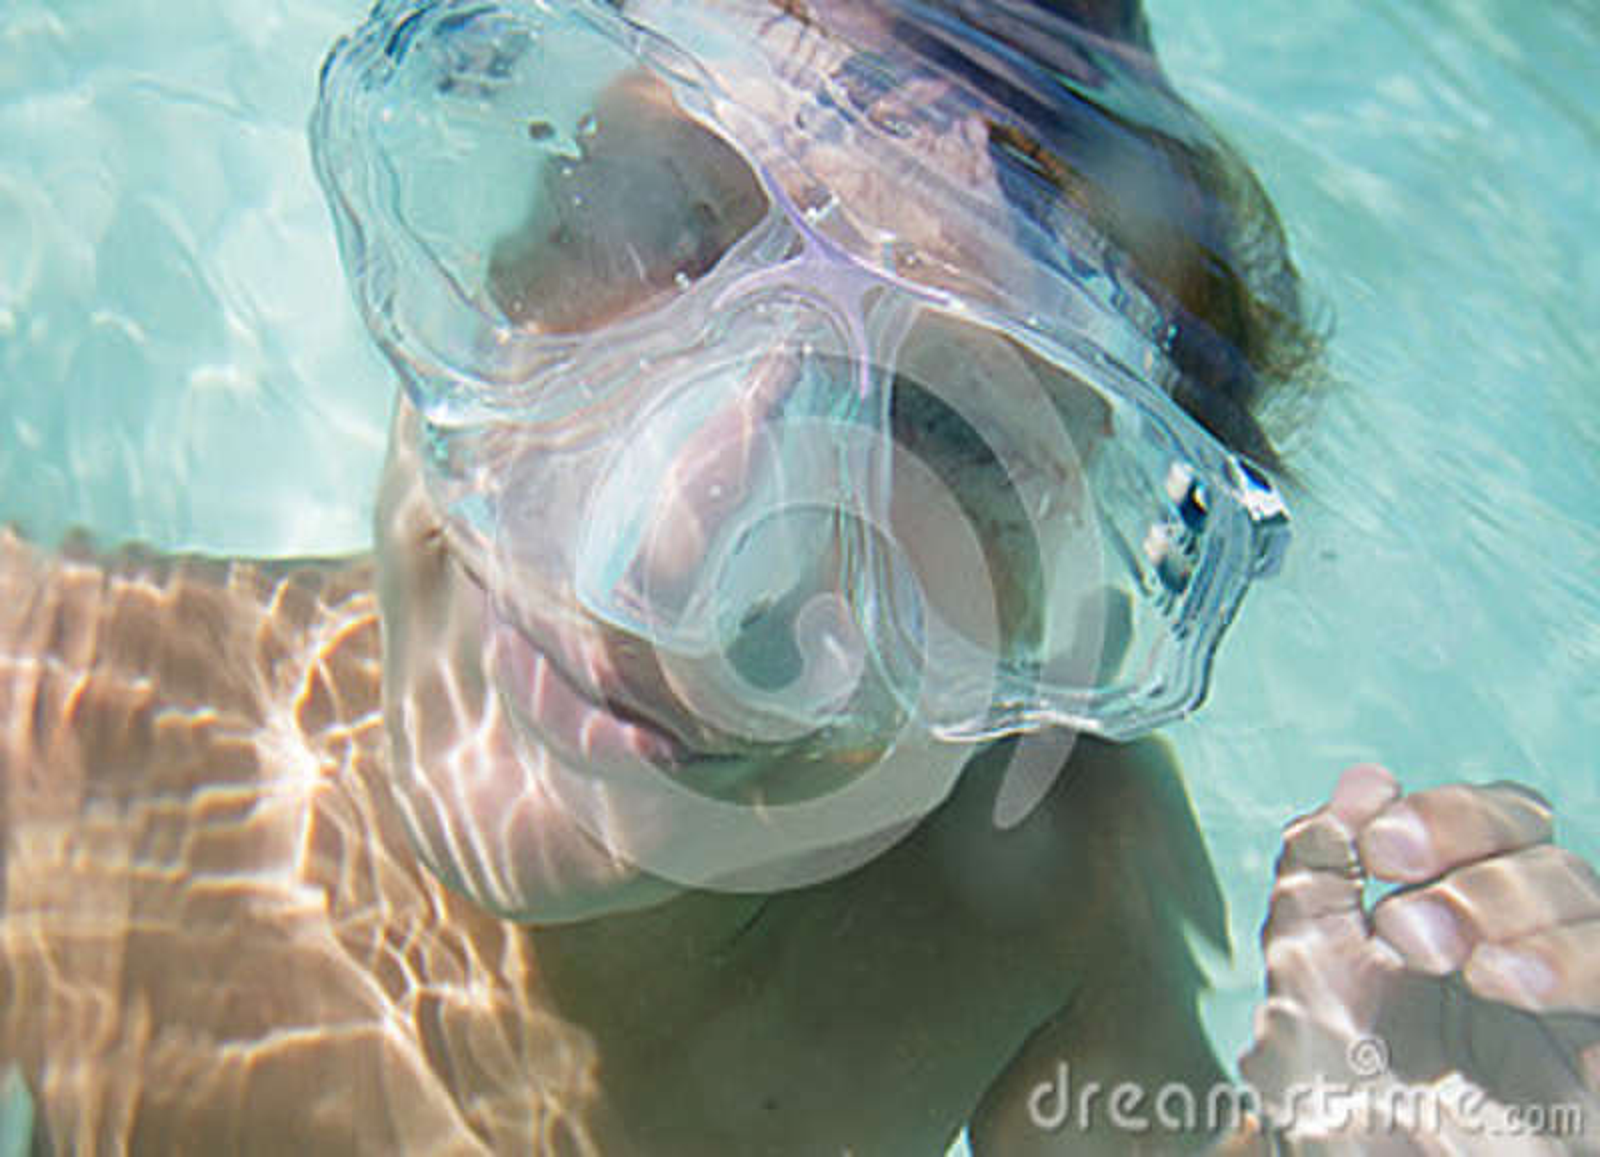 Retrato subaquático do menino, mergulhando na máscara